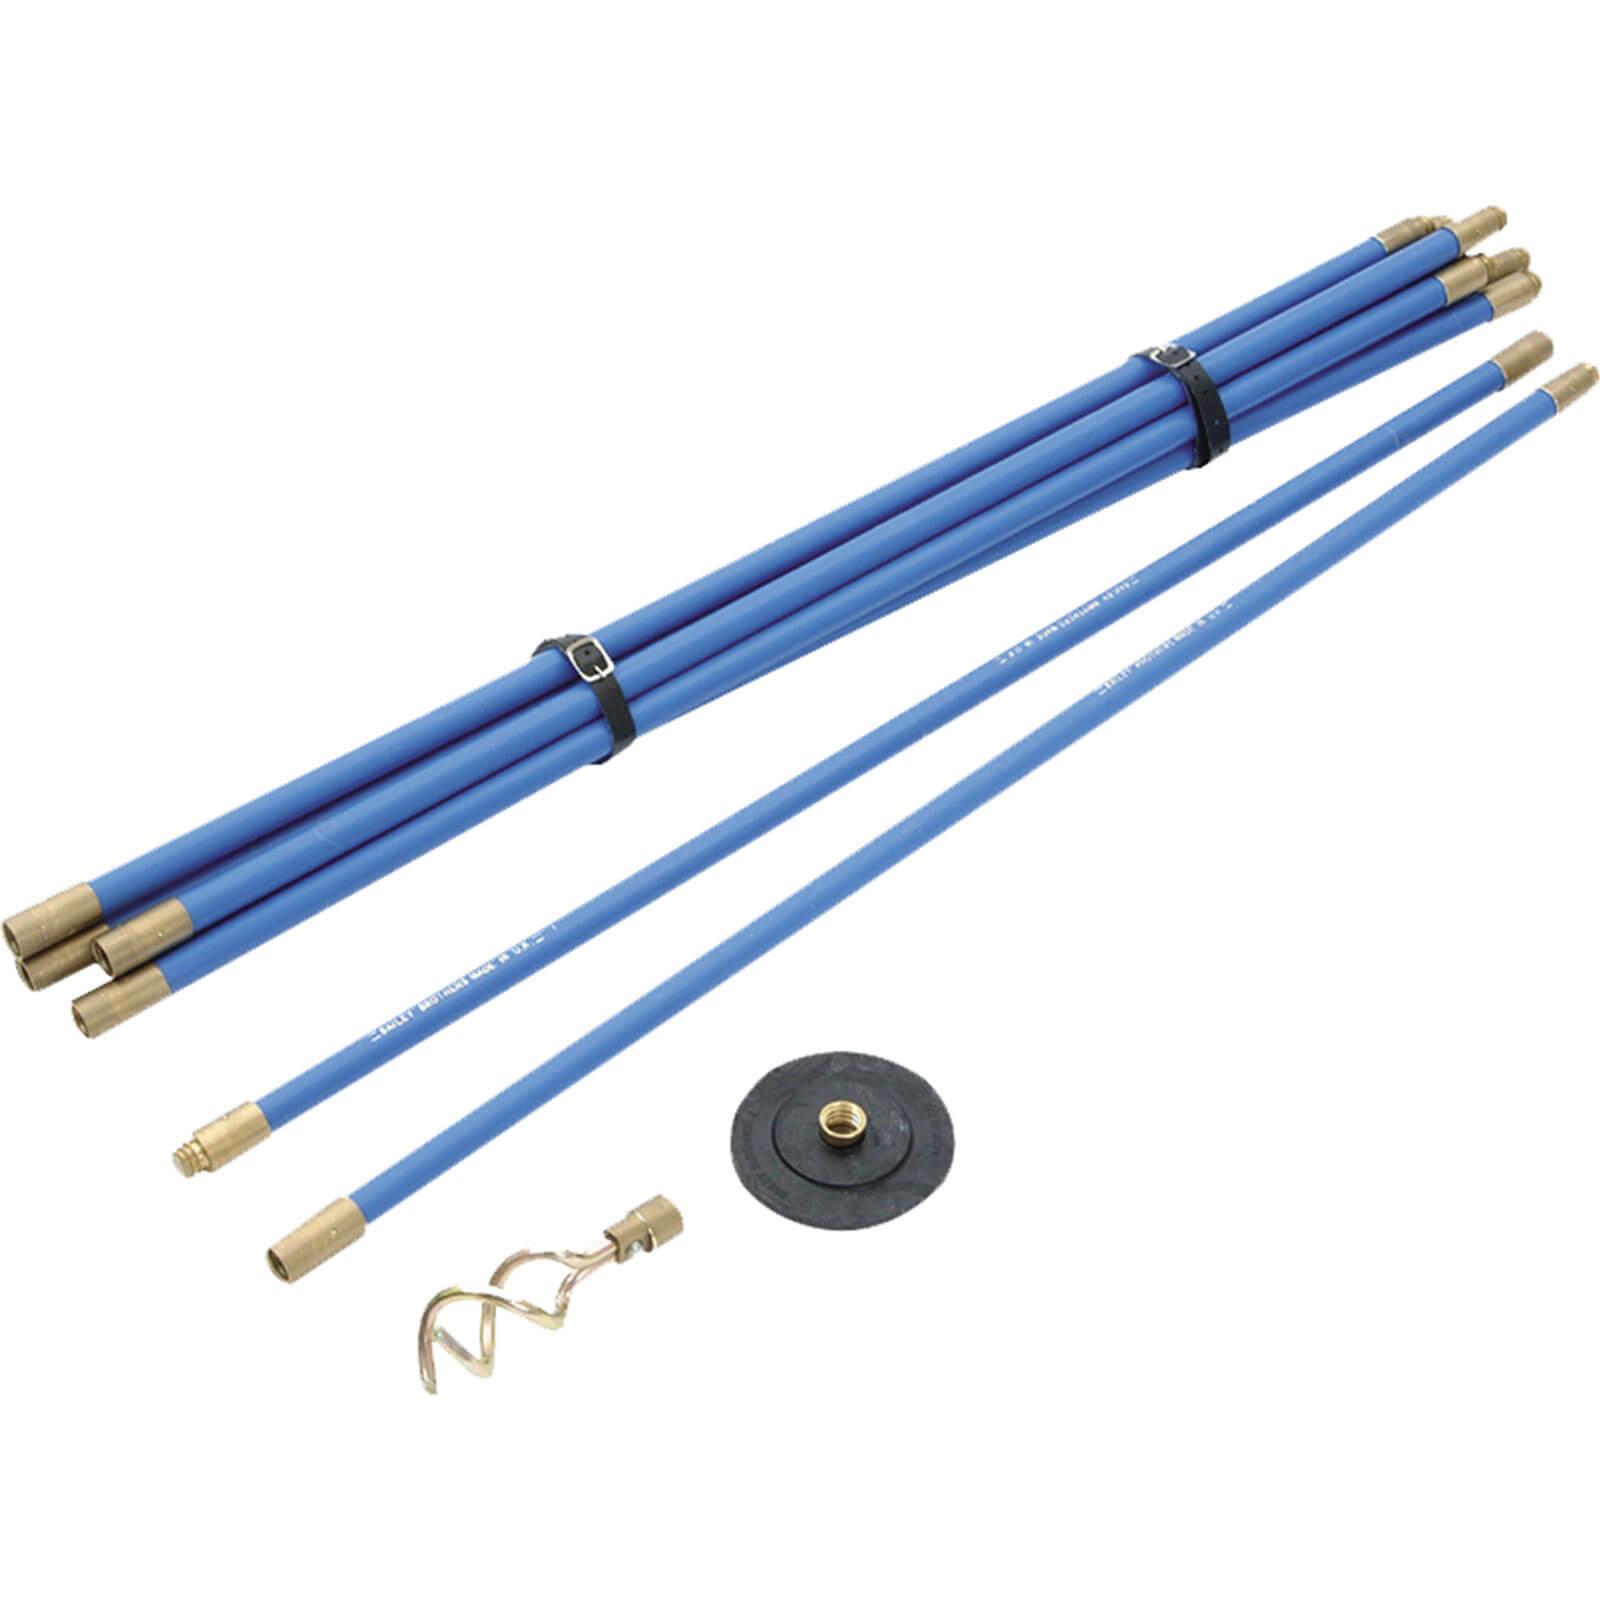 "Bailey 1470 Uni 3/4"" Drain Rod Set 2 Tools"